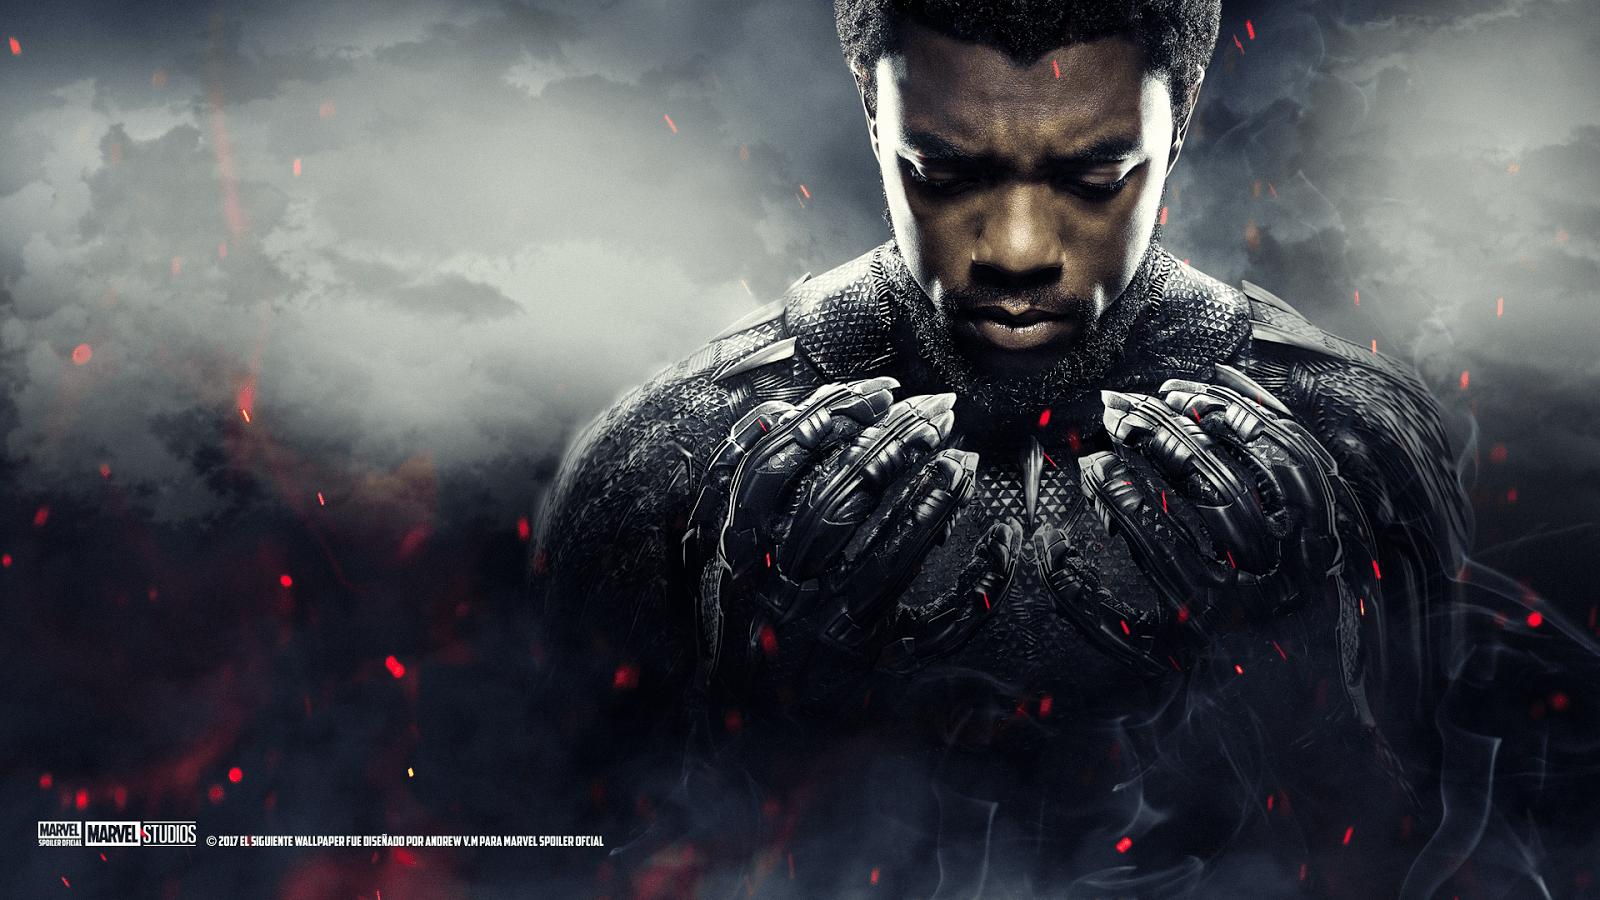 Black Panther Wallpaper Marvel: Black Panther Movie Wallpapers